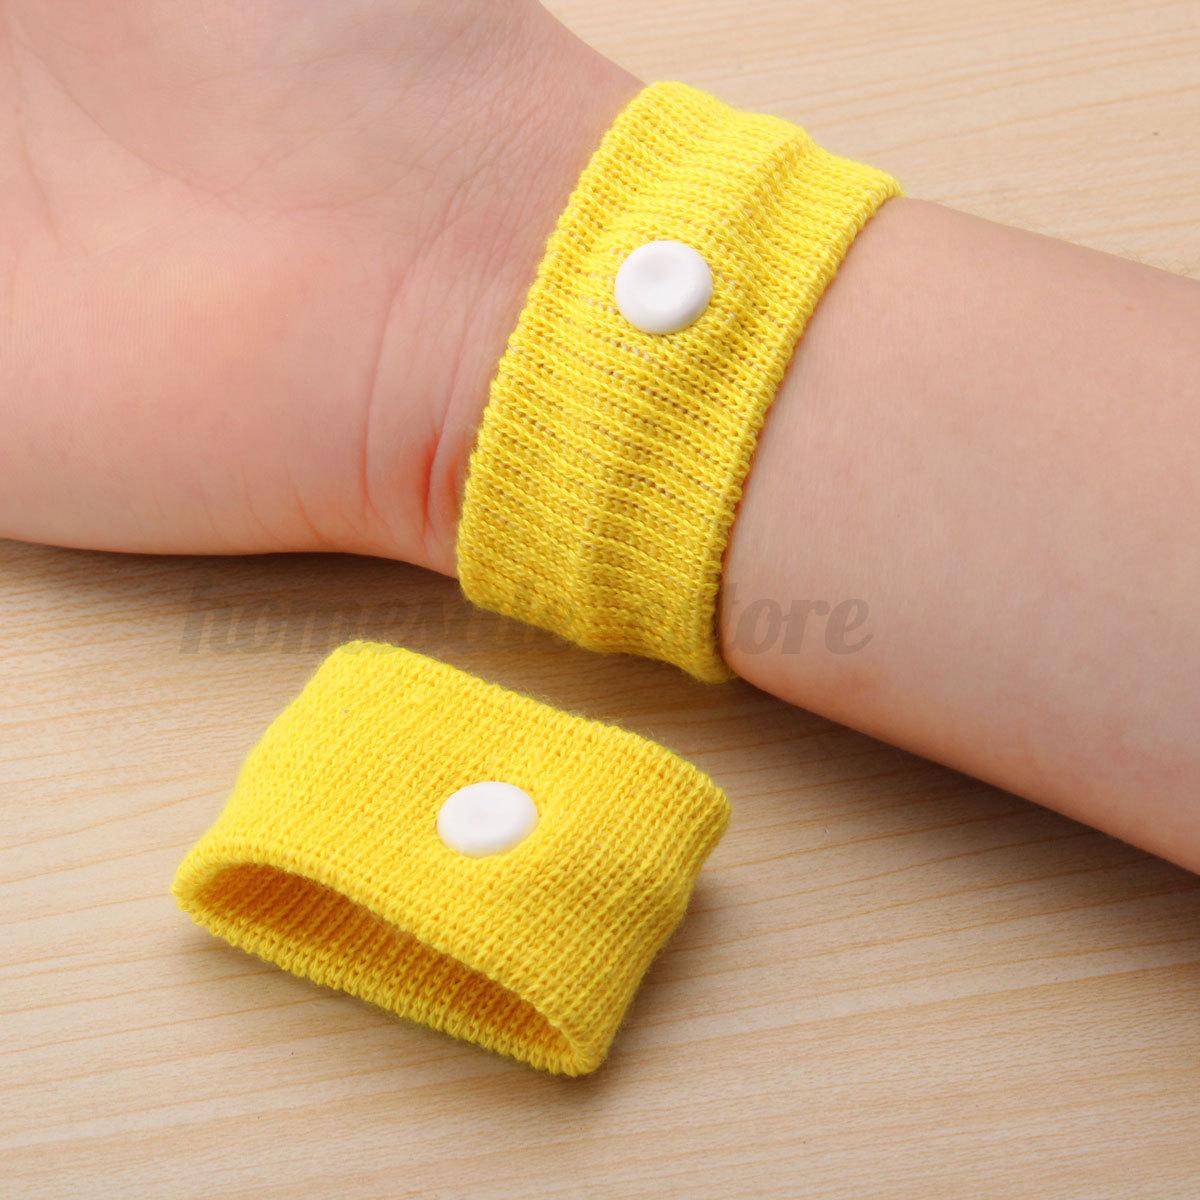 Nausea wristbands